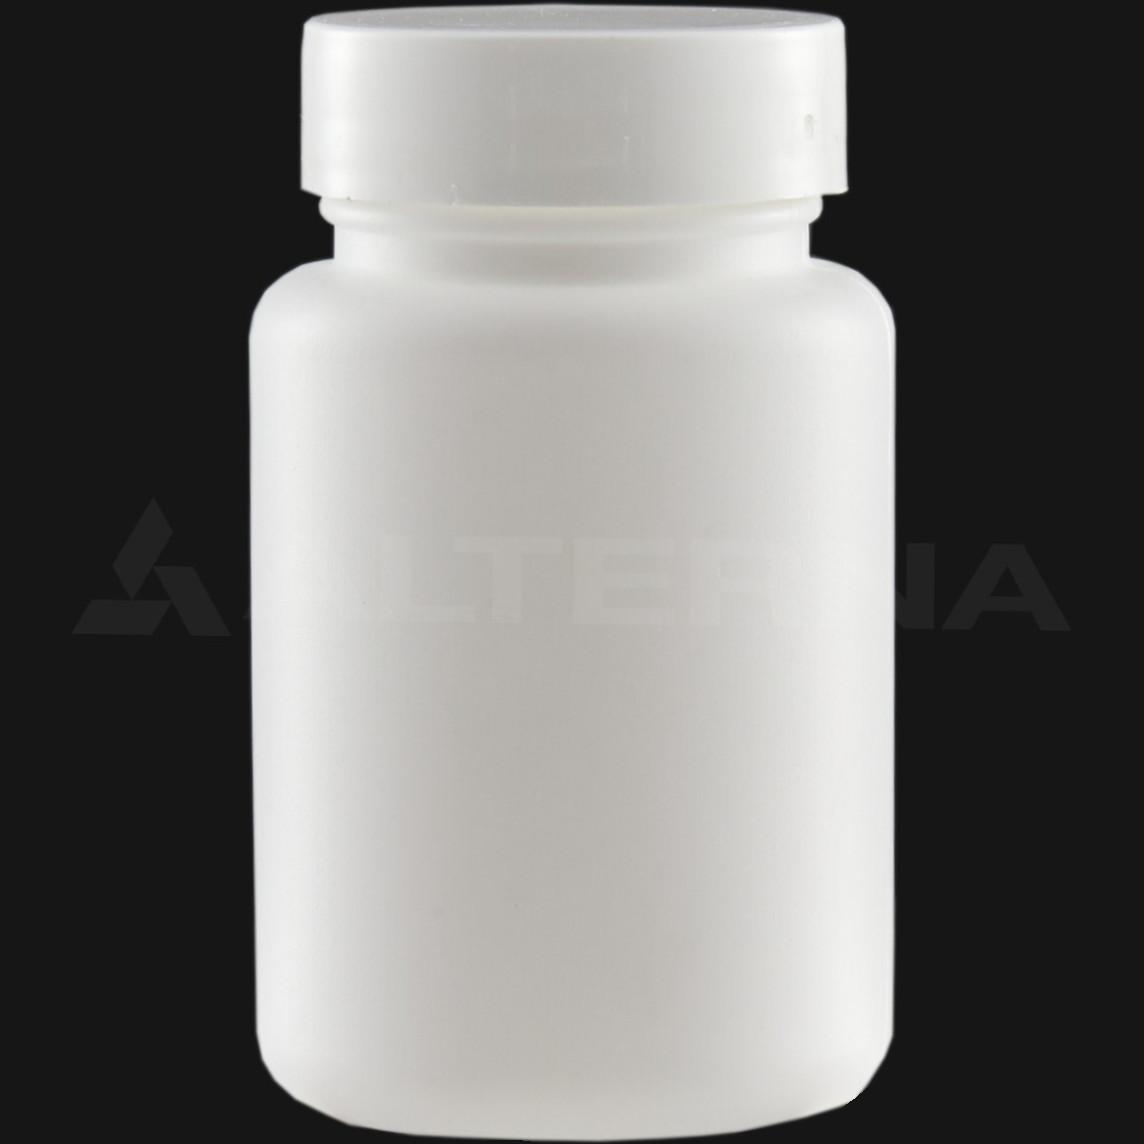 100 ml HDPE Pill Bottle with 38 mm Alu. Foil Seal Cap